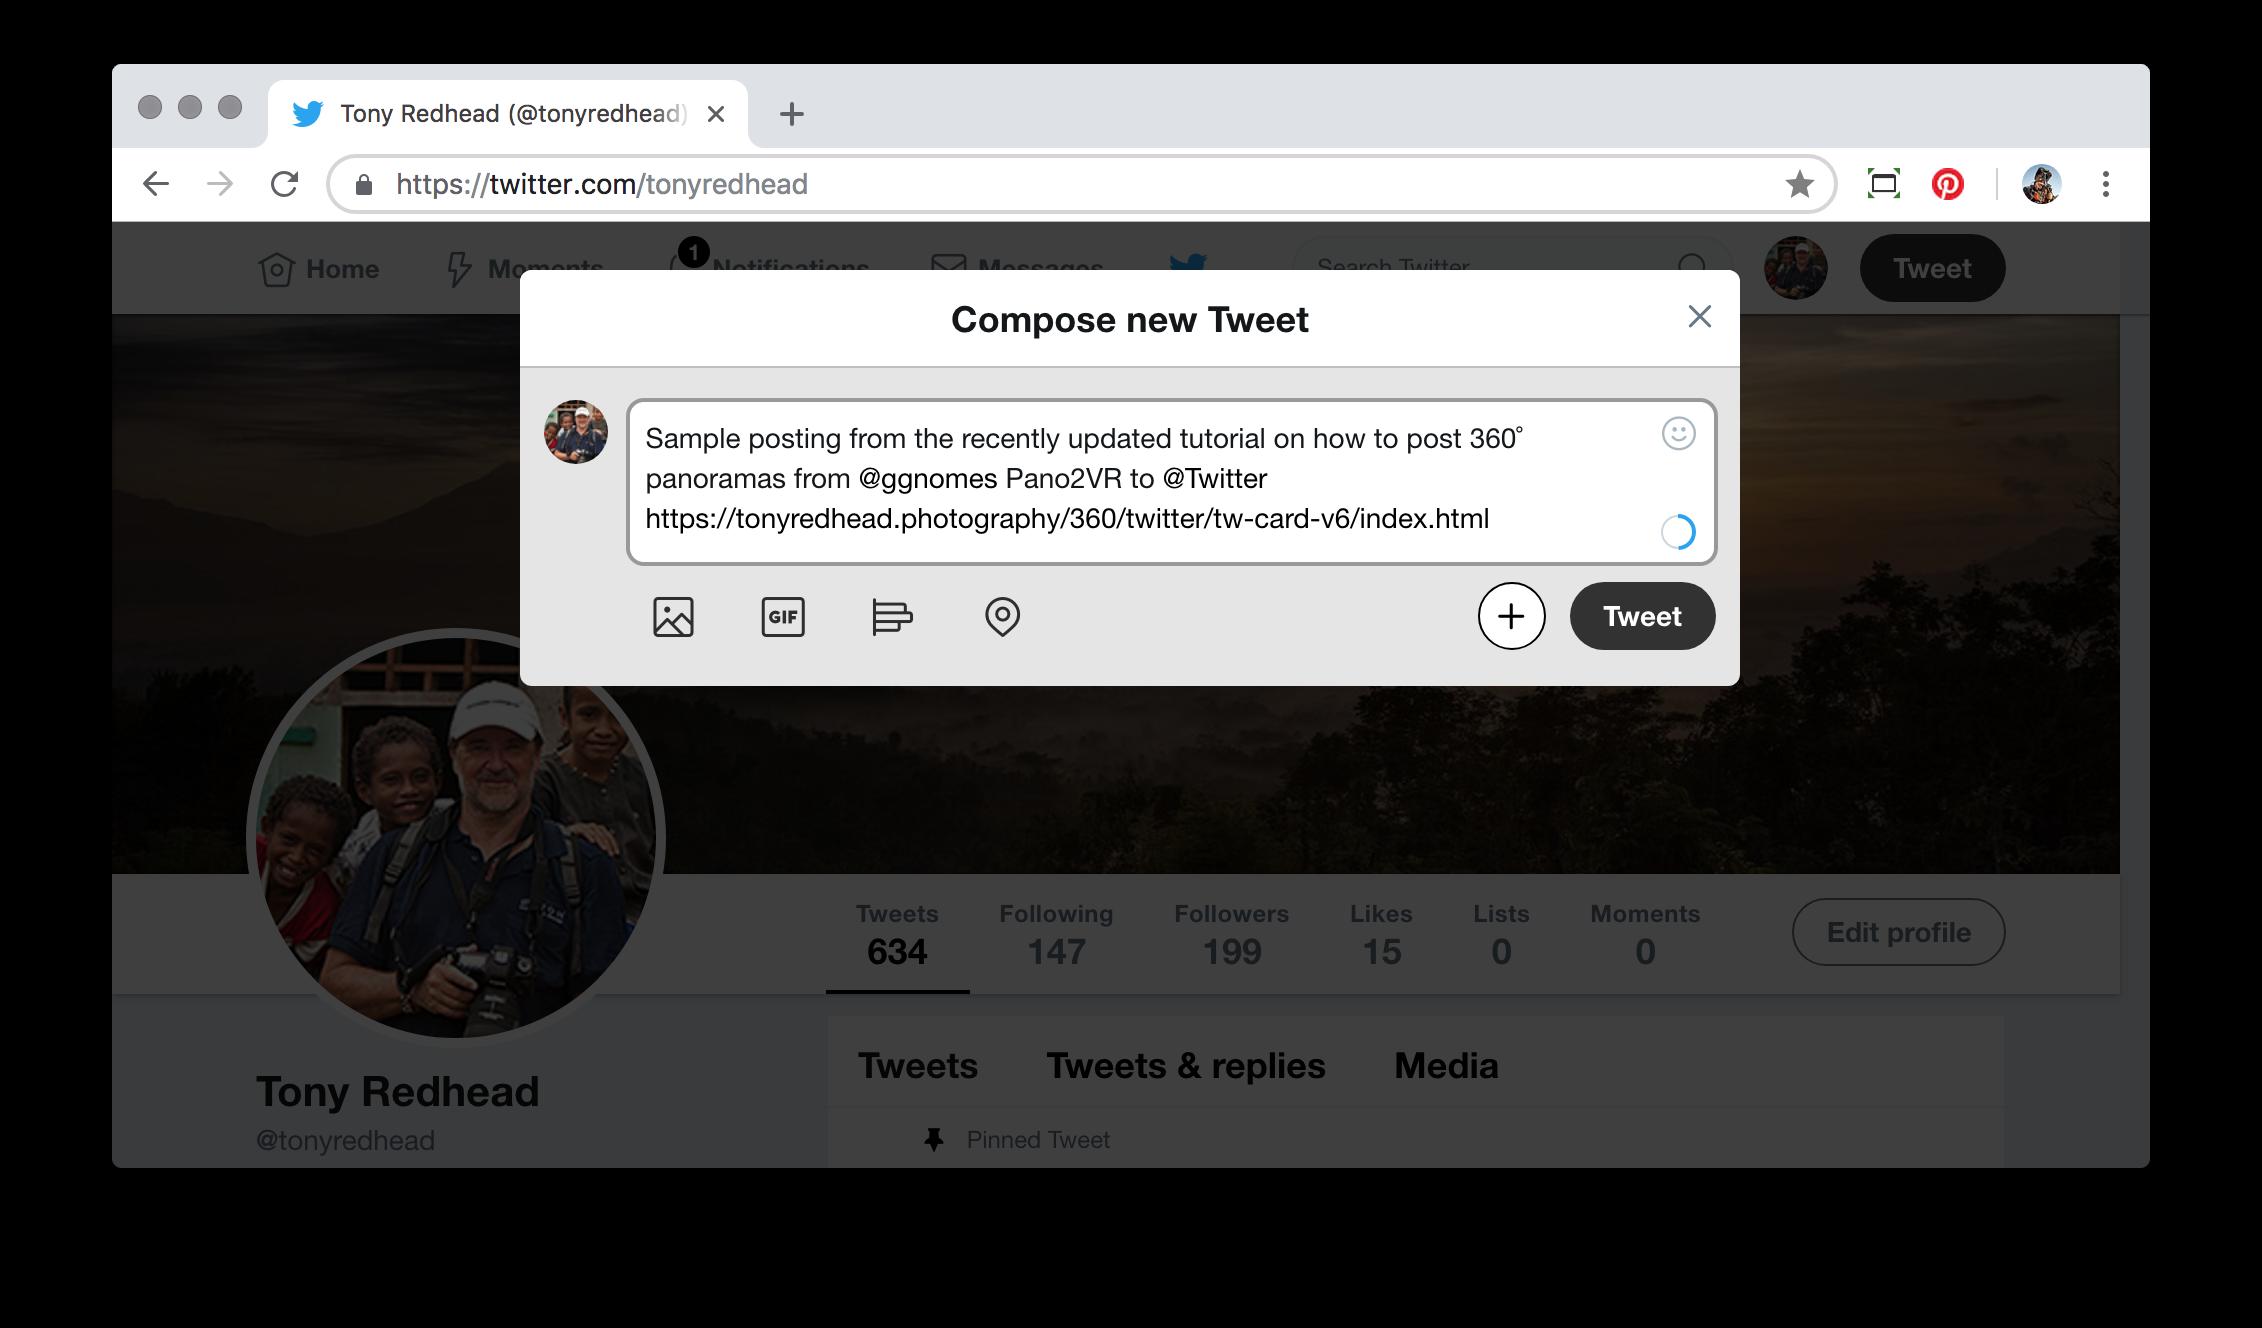 Figure #11: Compose new Tweet